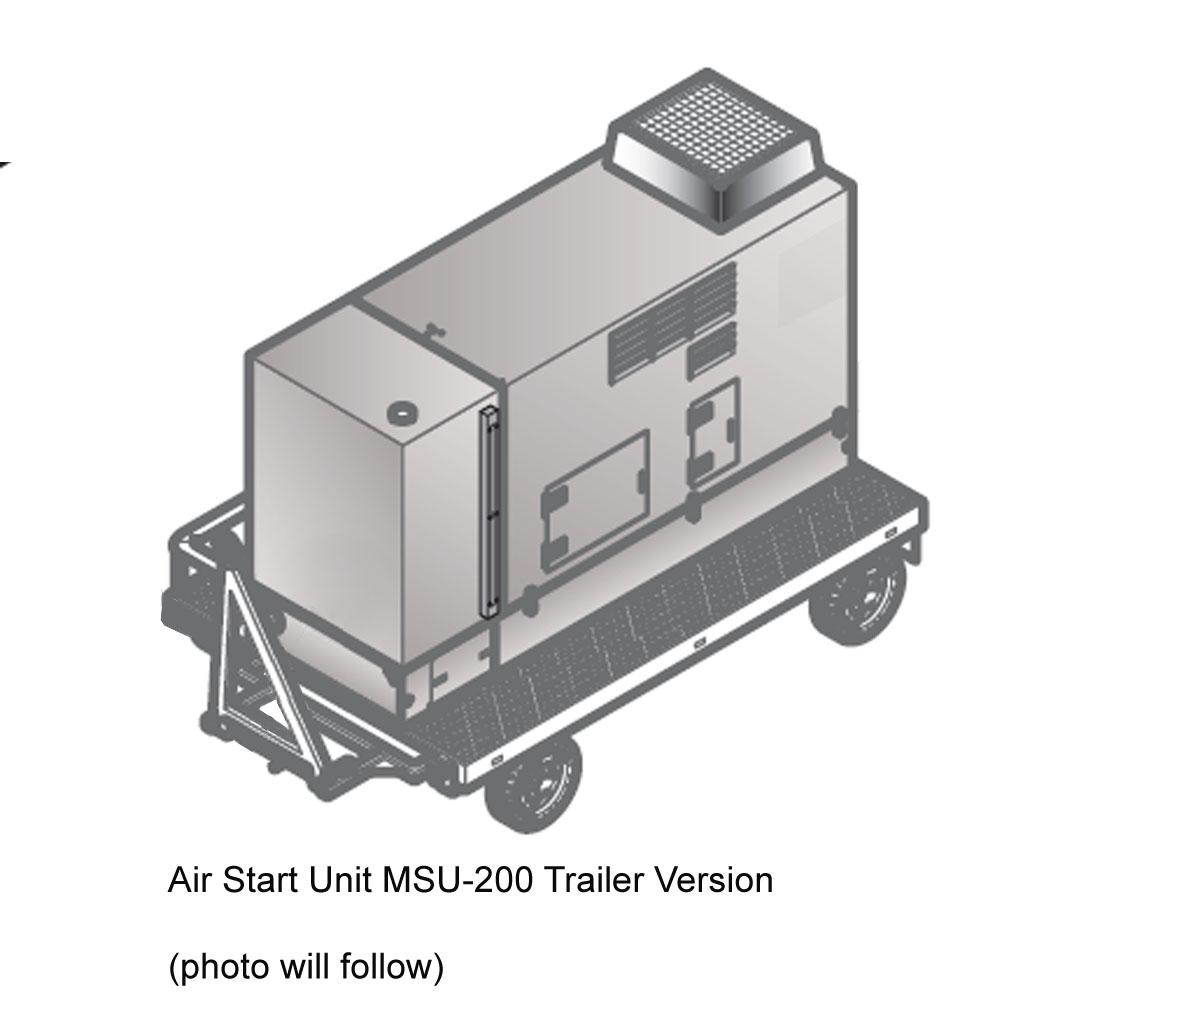 Air Start Unit Rheinmetall MSU-200 204 PPM Drawing